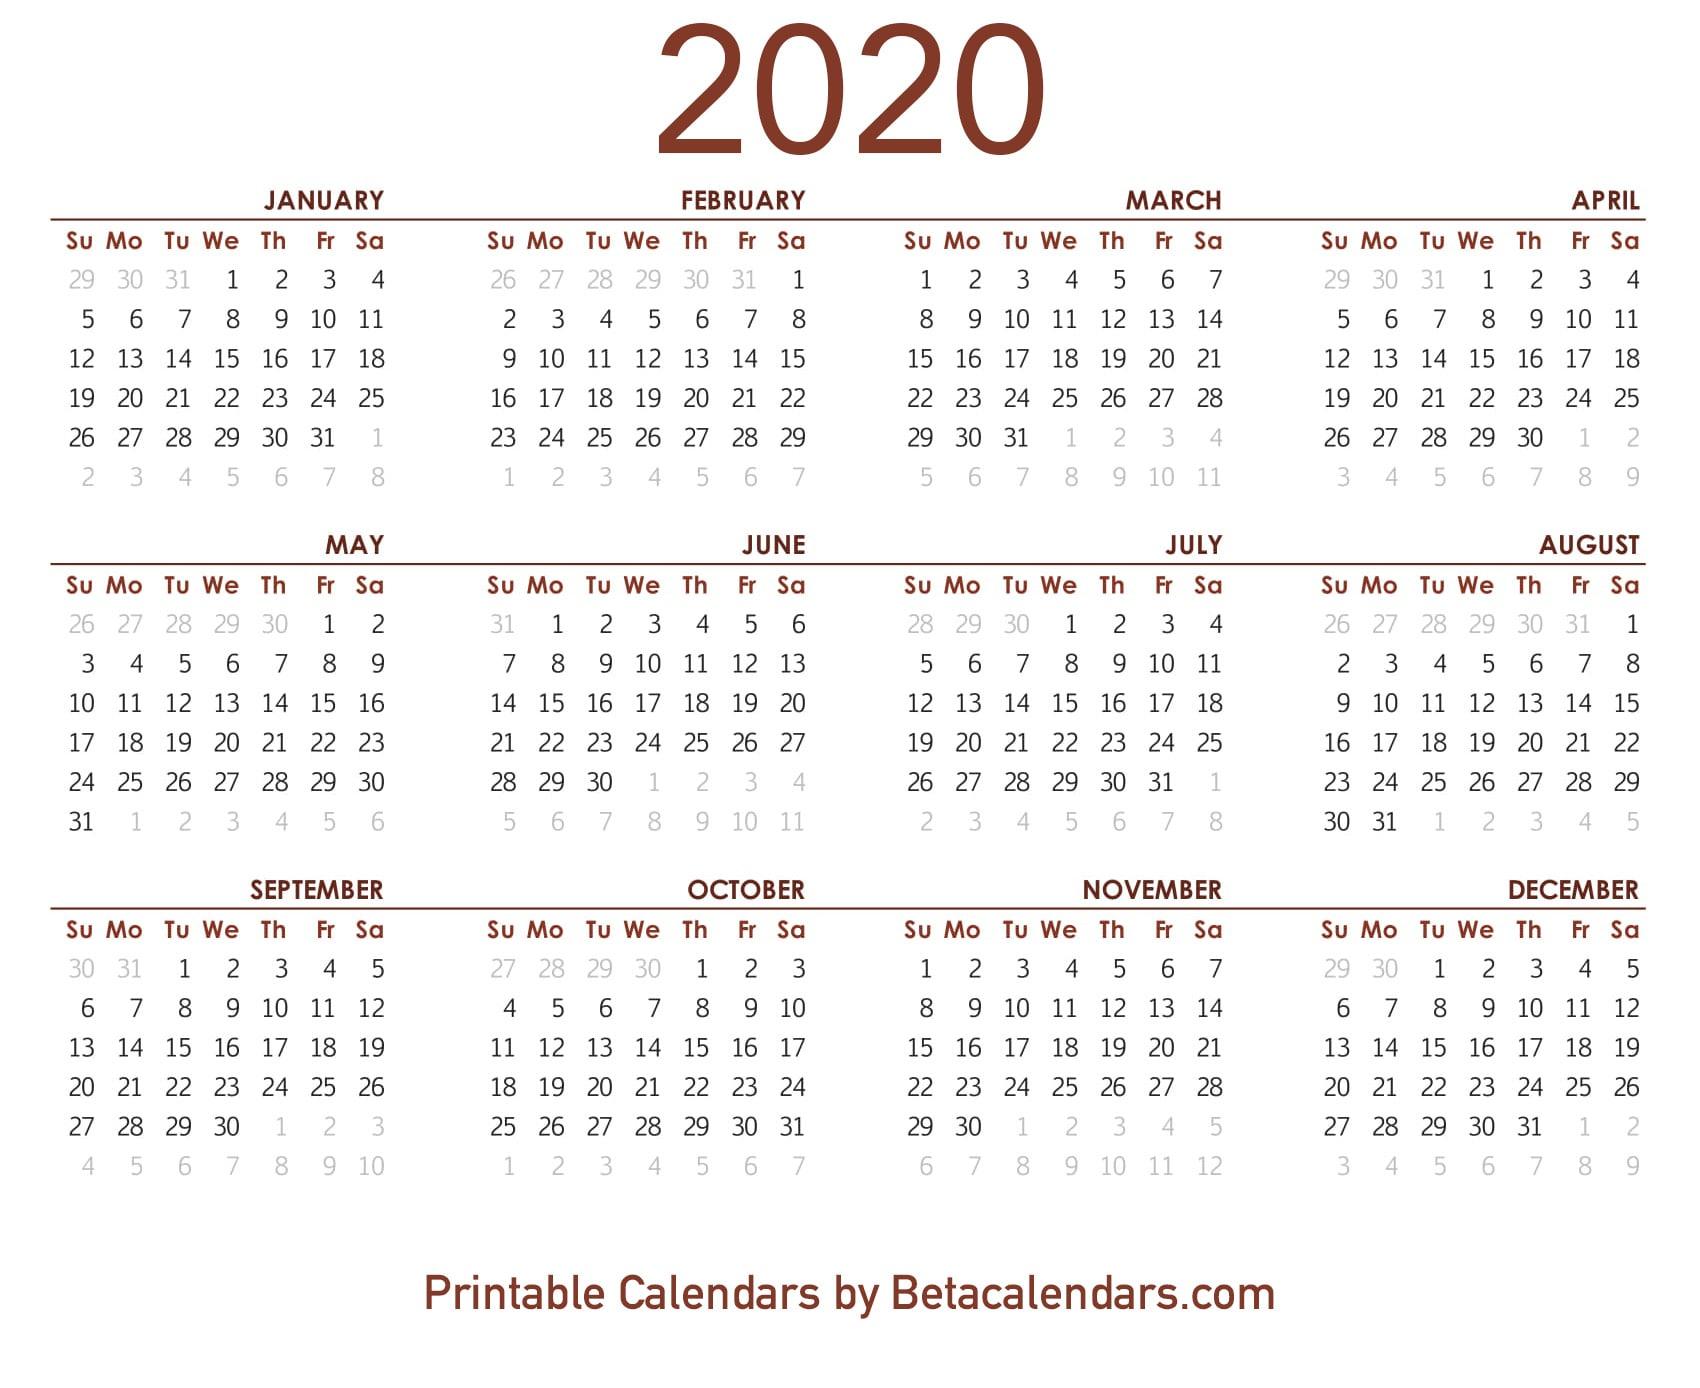 2020 Calendar - Beta Calendars intended for U Of M 2019 2020 Calendar